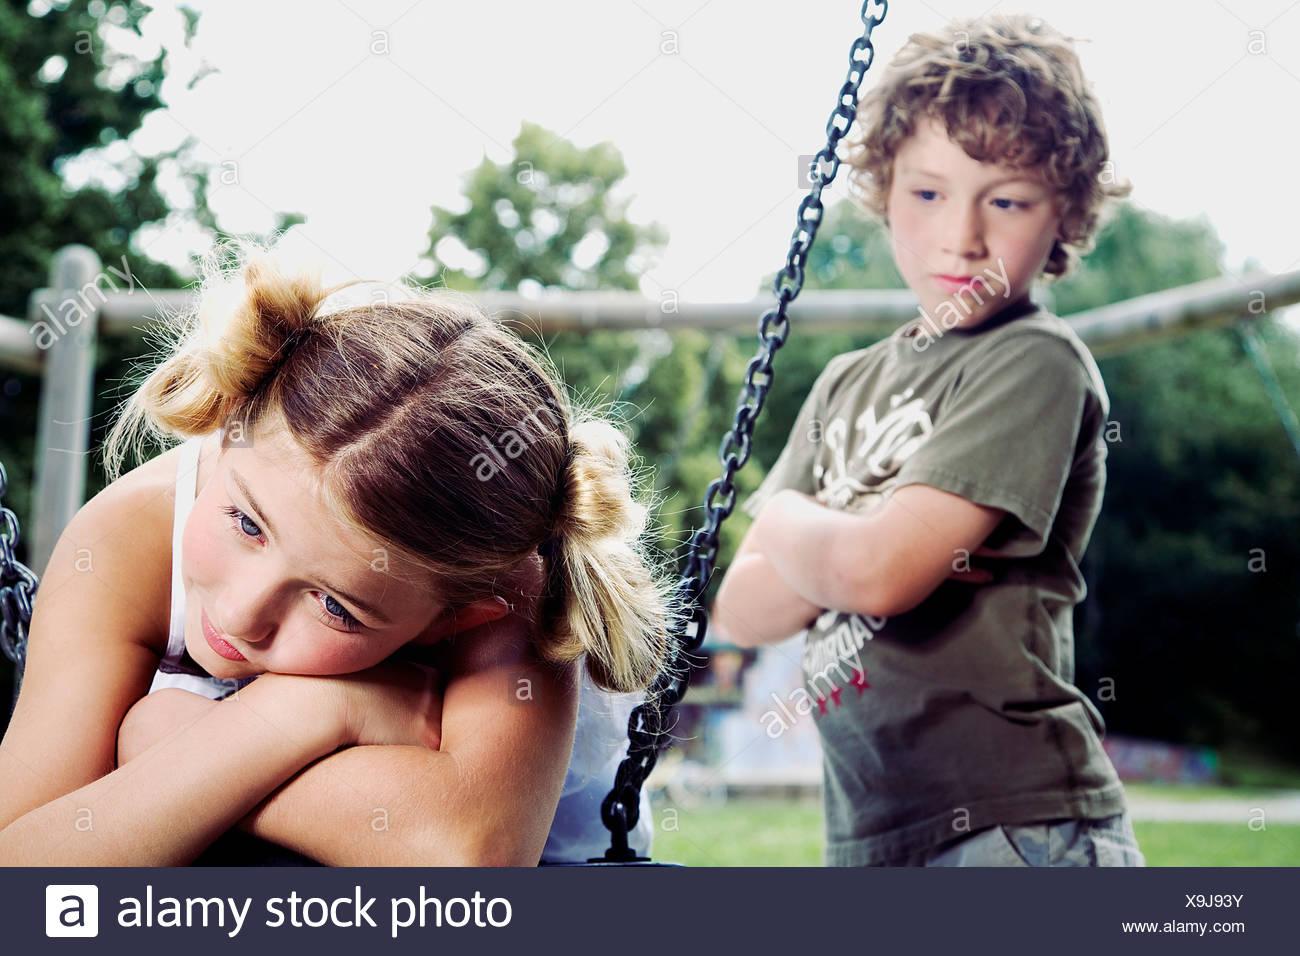 41427ff2e7ef6 young boy watching sad girl at playground Stock Photo  281300095 - Alamy